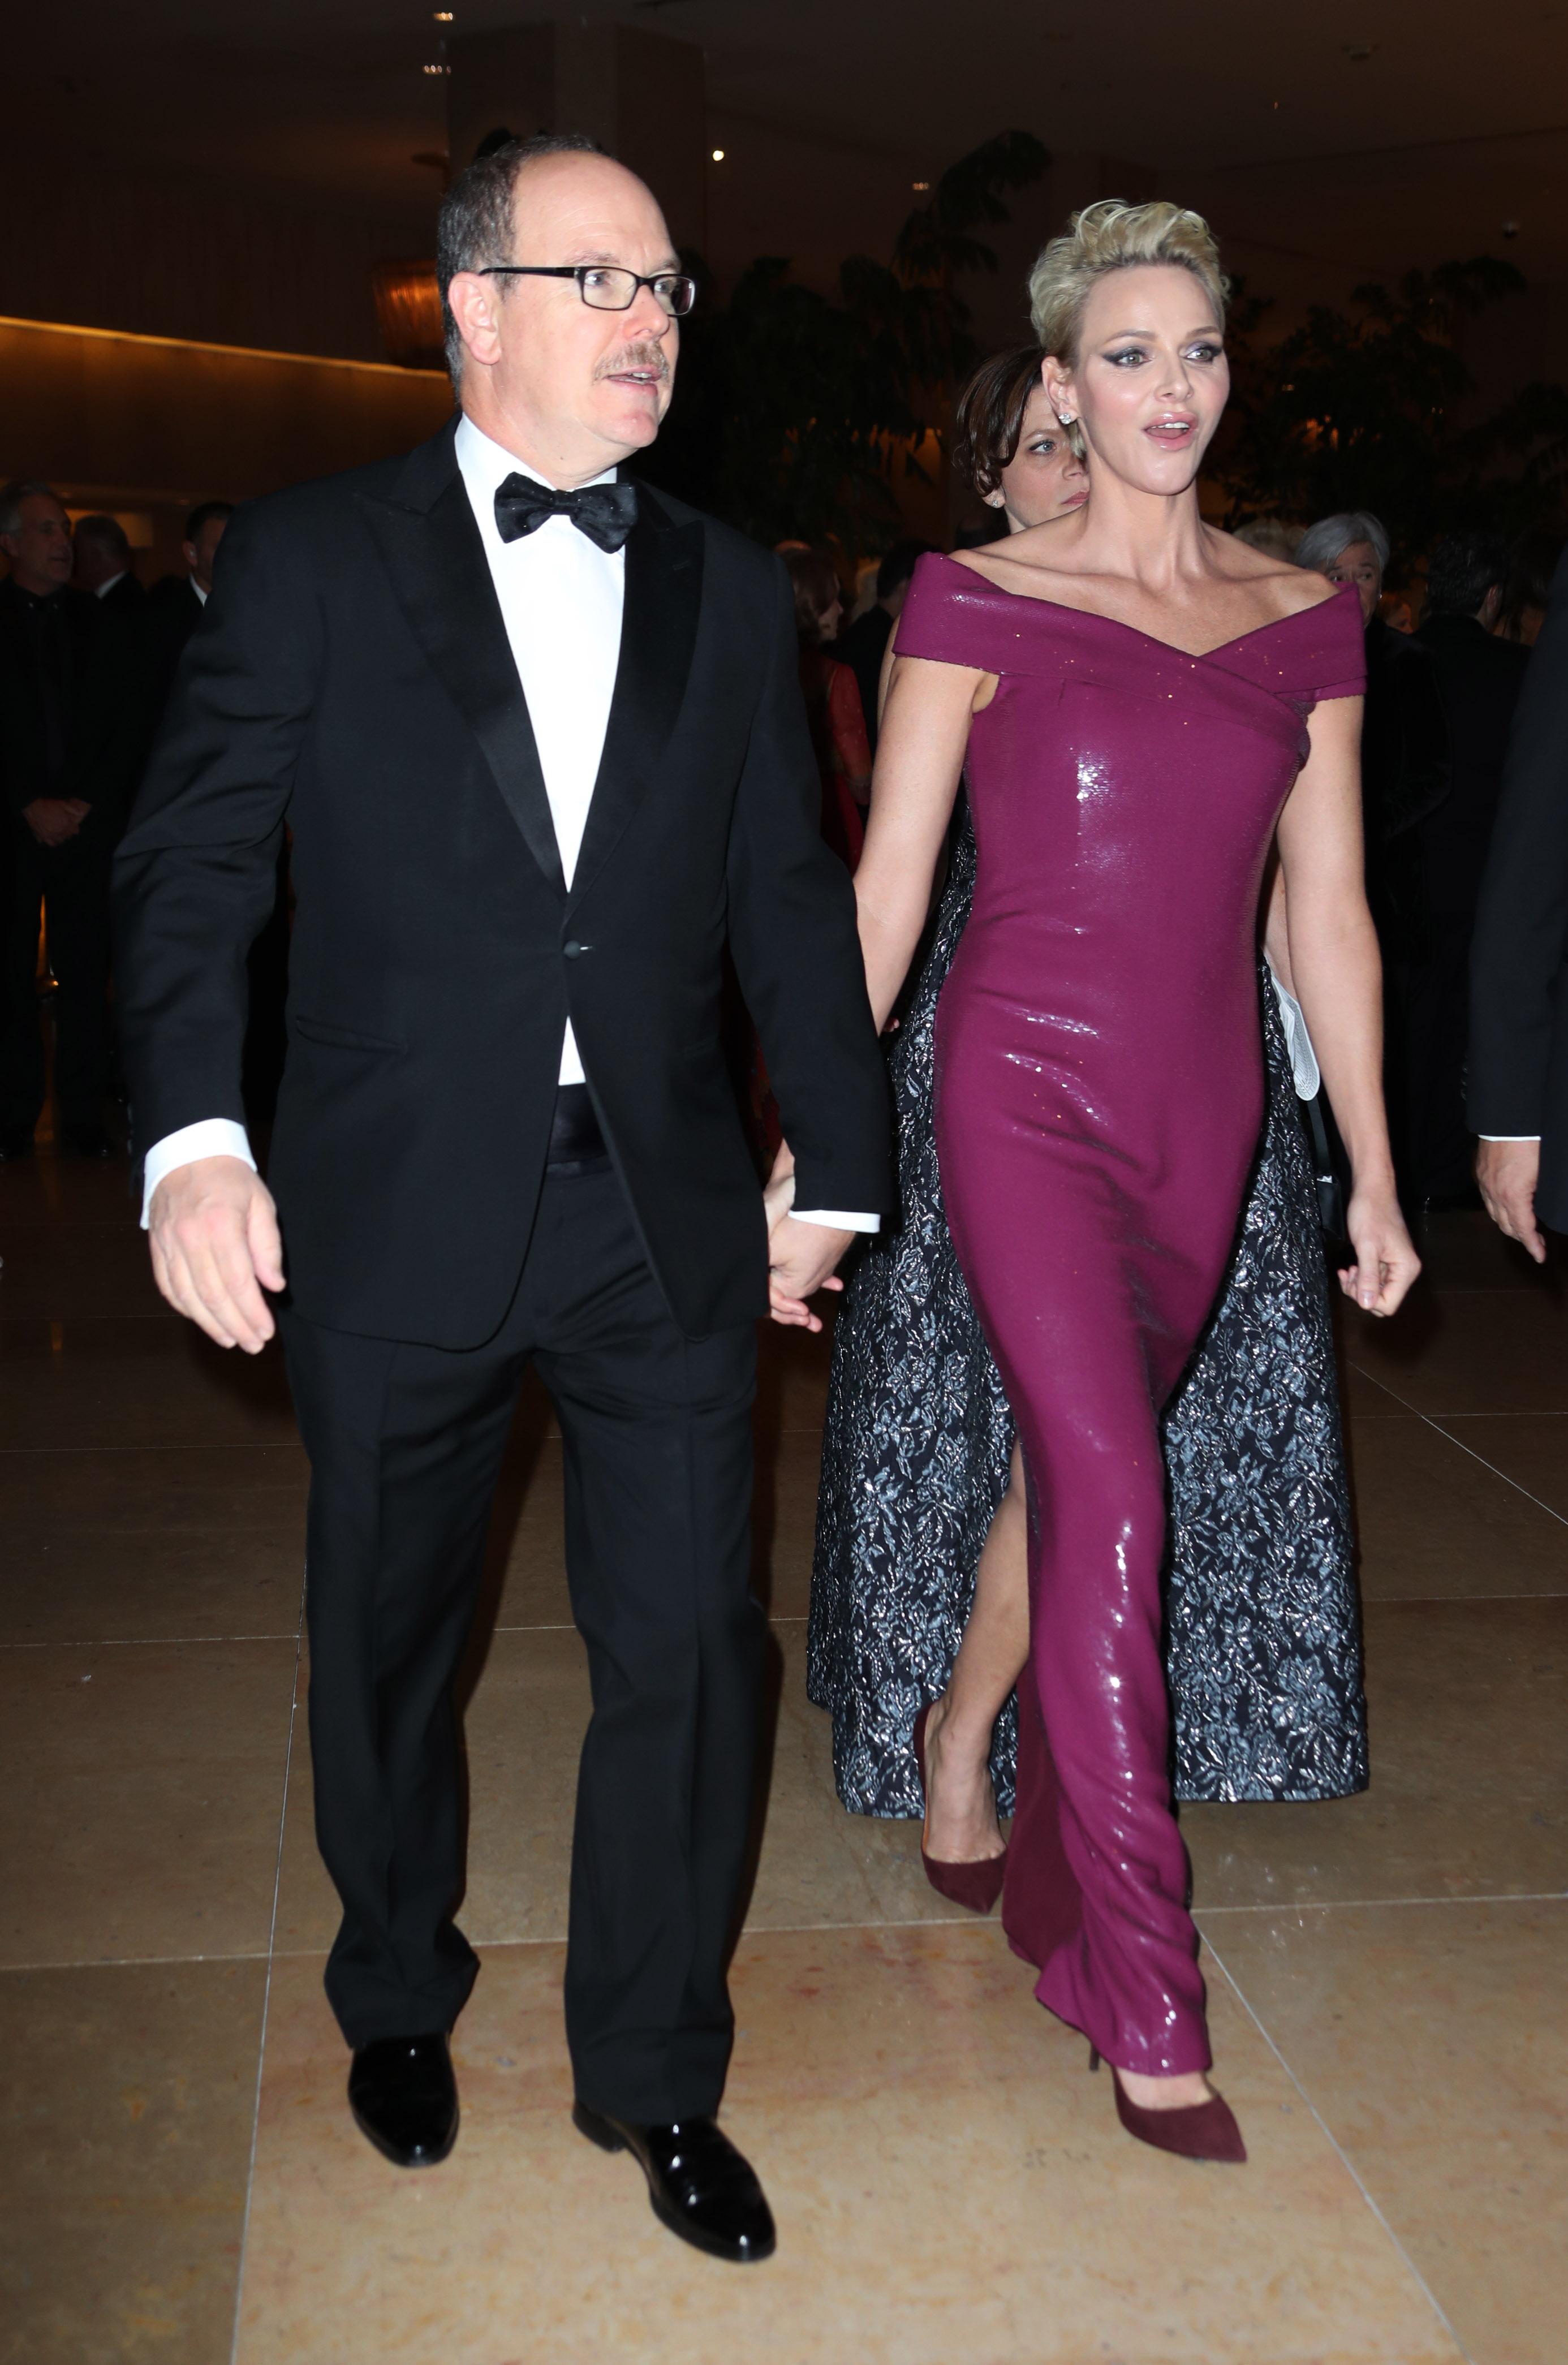 Princess Charlene and Prince Albert II of MonacoPrincess Grace Awards Gala, Arrivals, Los Angeles, USA - 25 Oct 2017